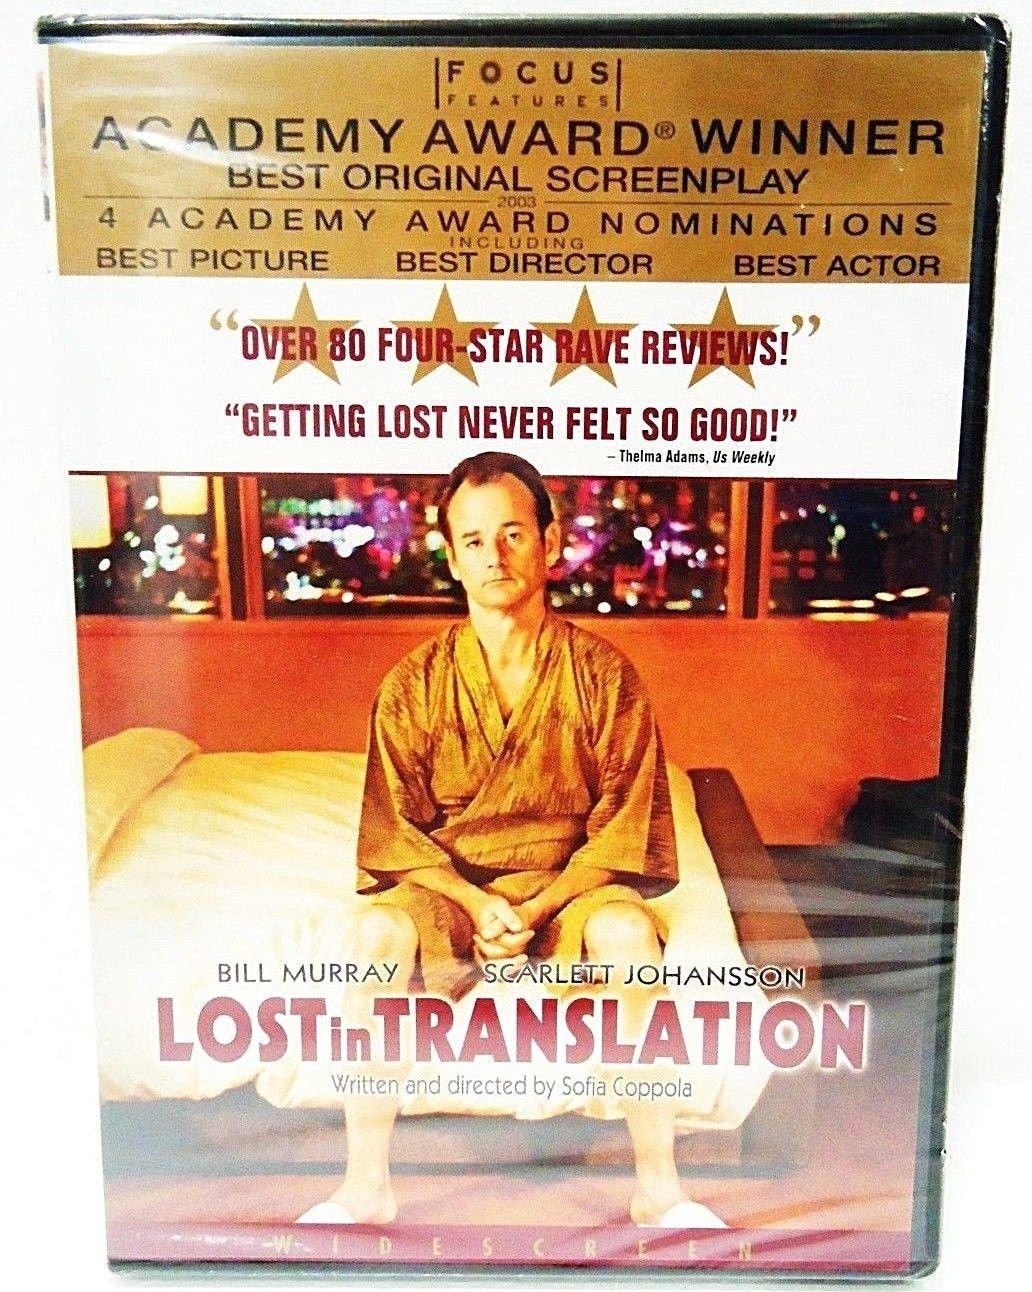 LOST IN TRANSLATION - DVD - BILL MURRAY - SCARLETT JOHANSSON - COMEDY - MOVIE